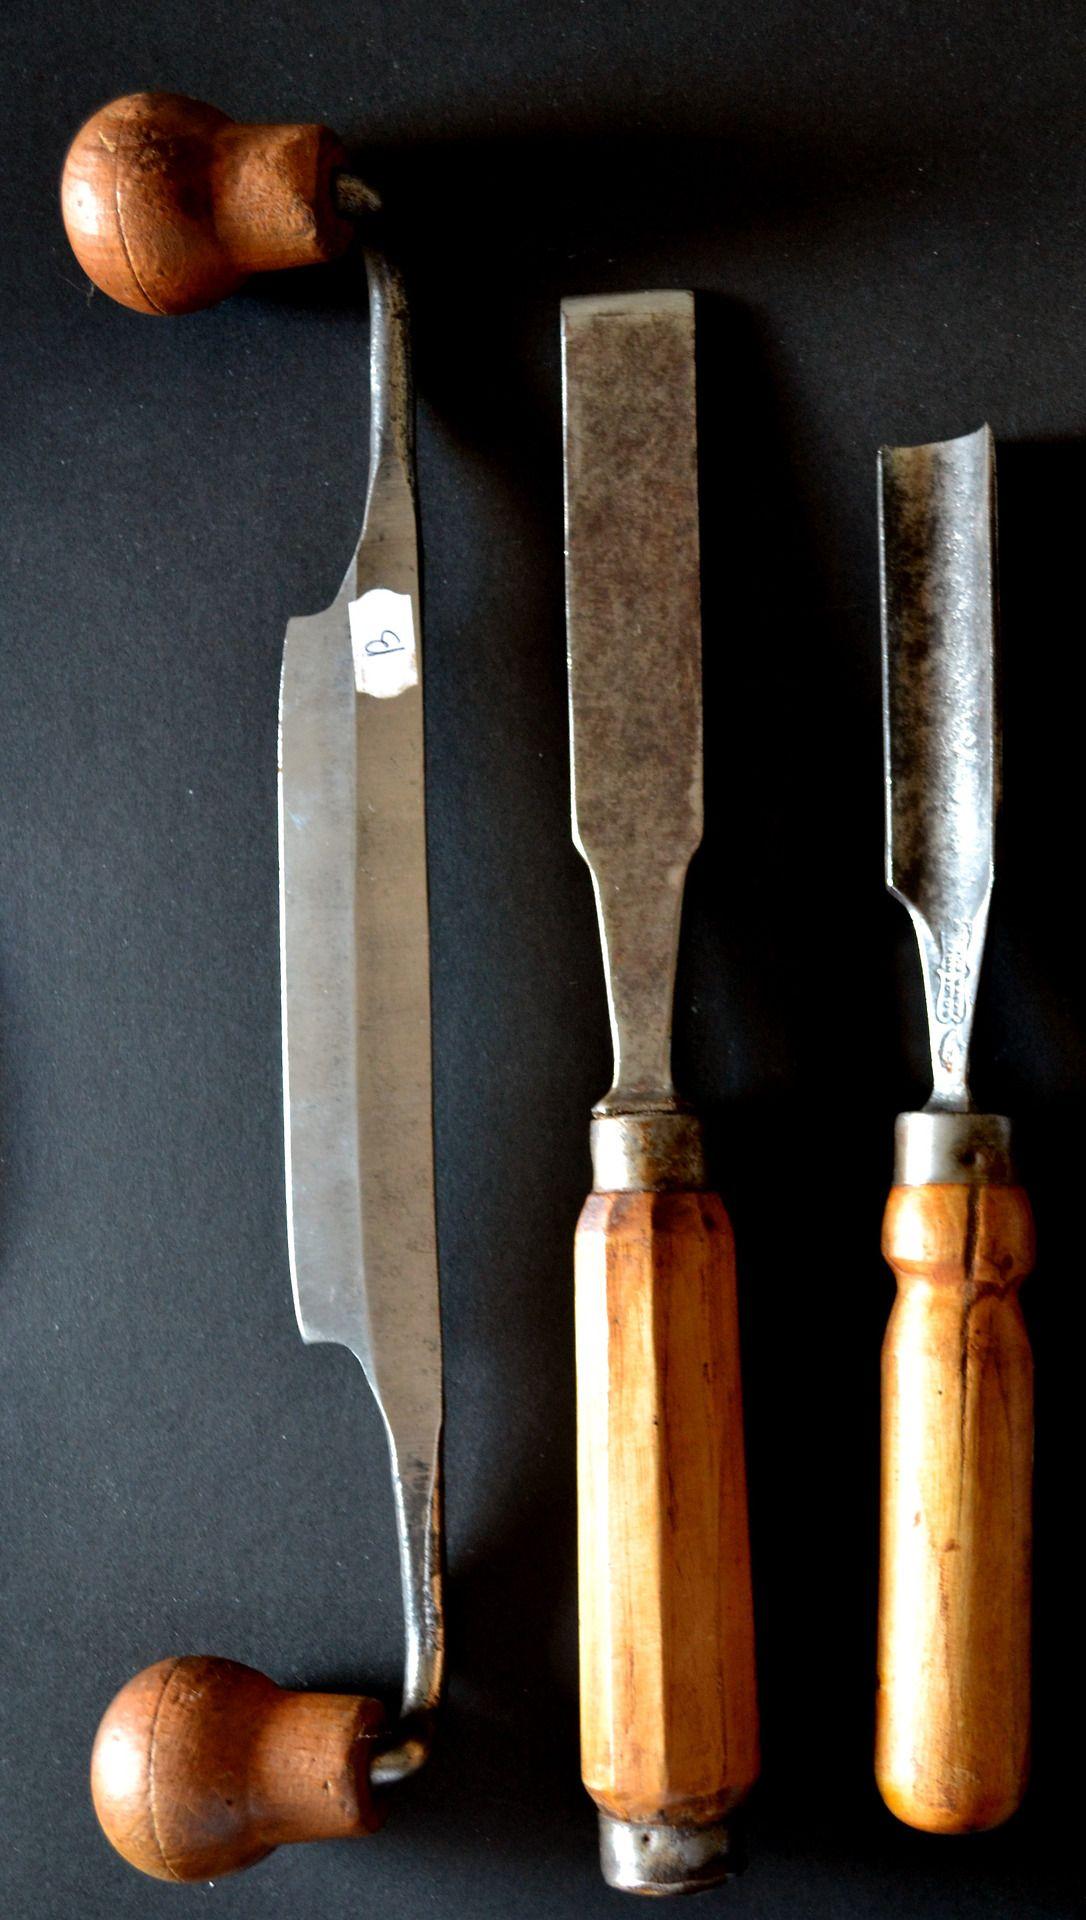 Outils de menuiserie | Knives/Blades/Tools/Bushcraft | Pinterest ...